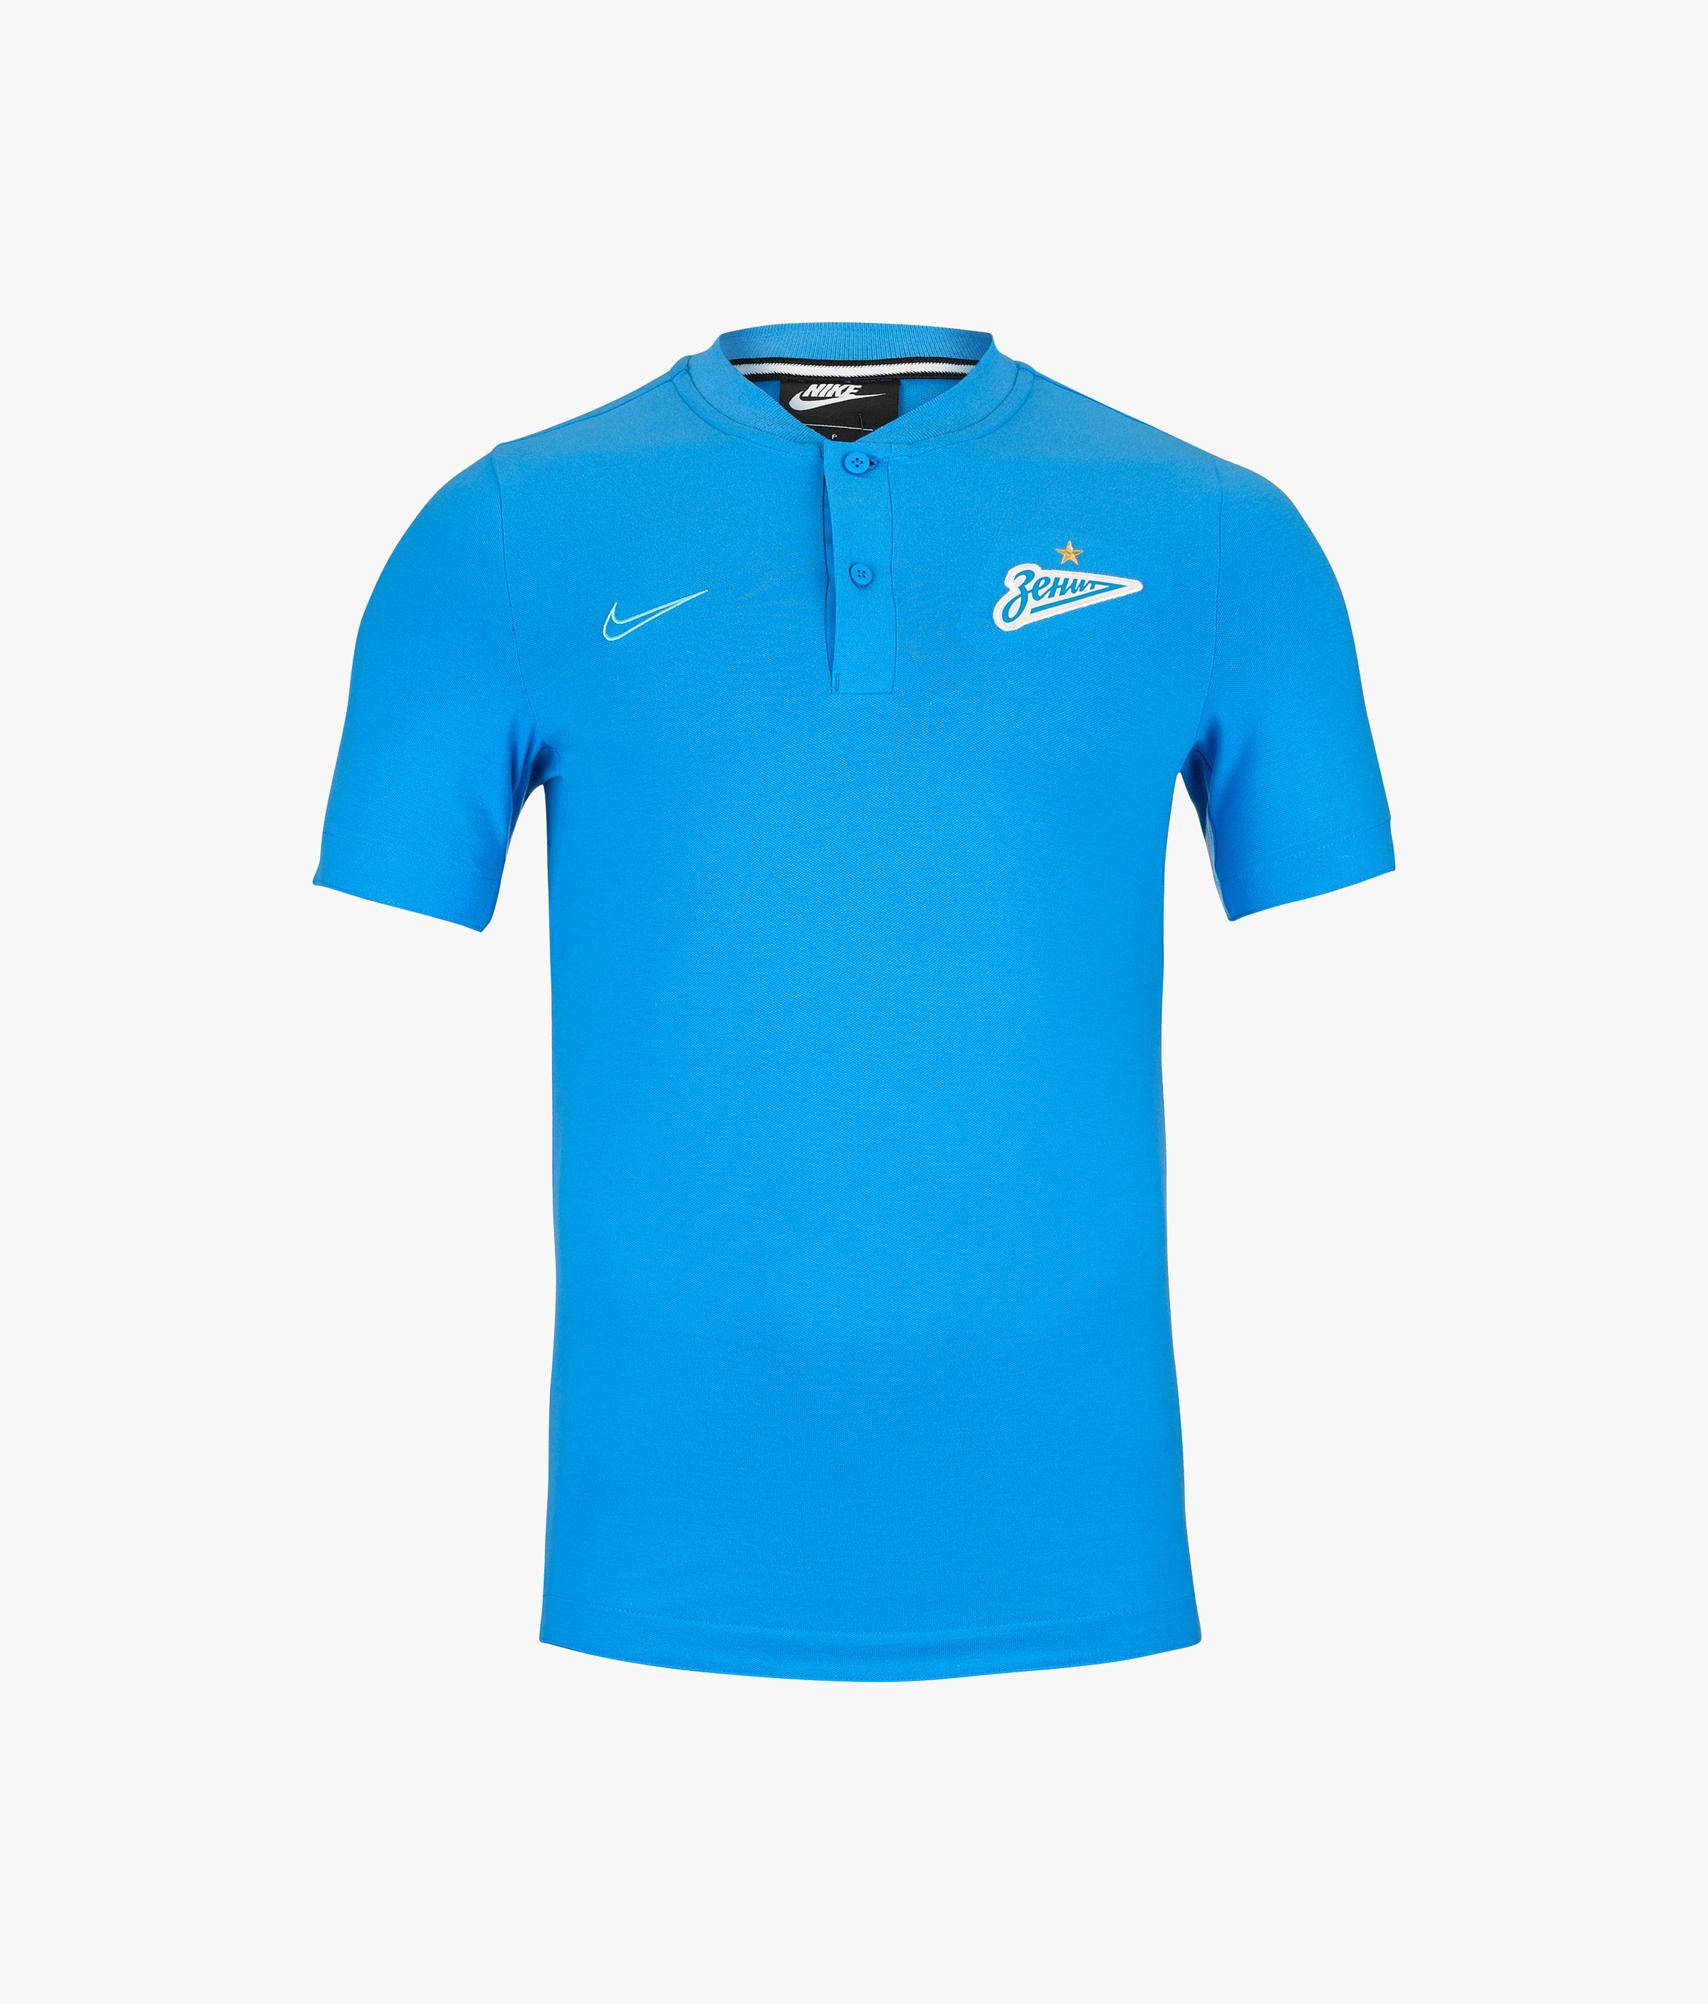 цена Поло Nike Zenit сезона 2019/20 Nike Цвет-Синий онлайн в 2017 году